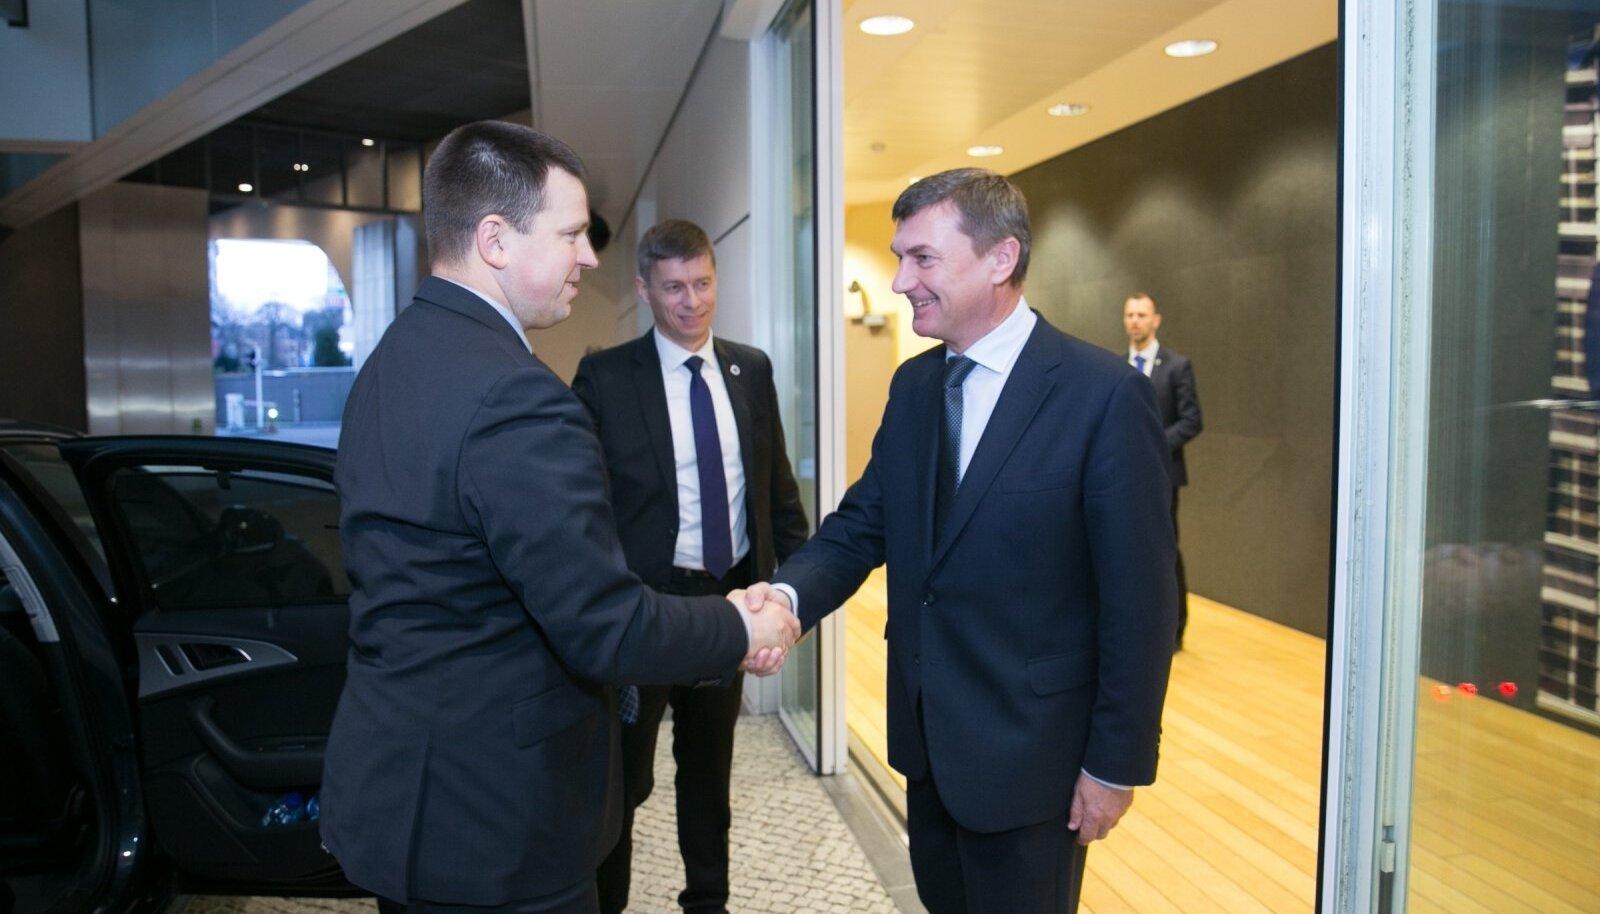 Jüri Ratas kohtus Donald Tuski, Jean-Claude Junckeri ja Andrus Ansipiga